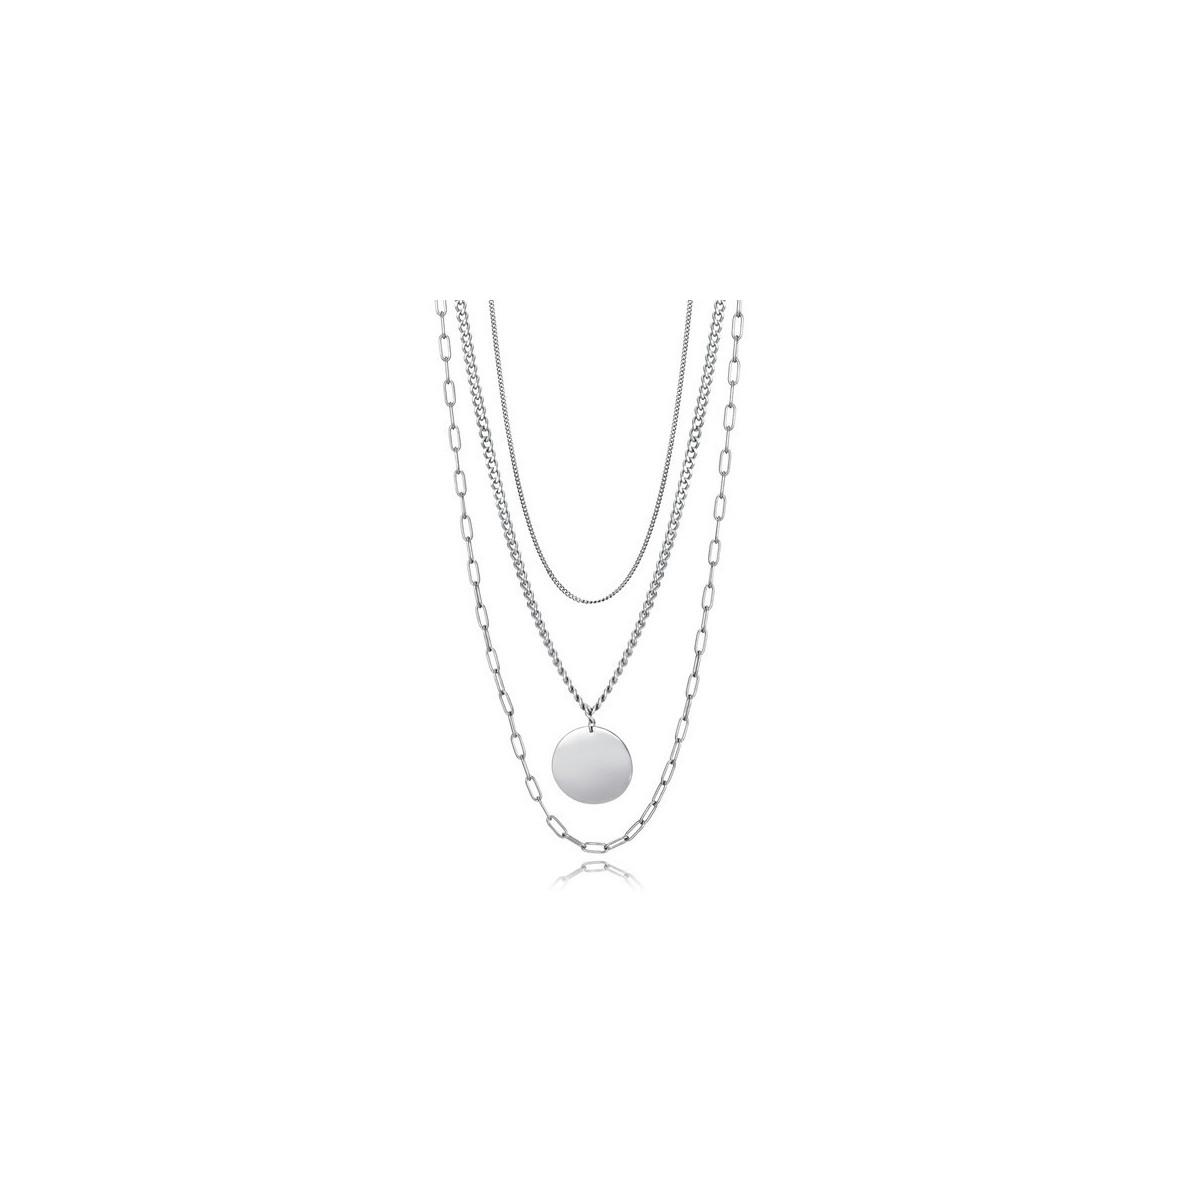 Collar Viceroy Chic 15055C01000